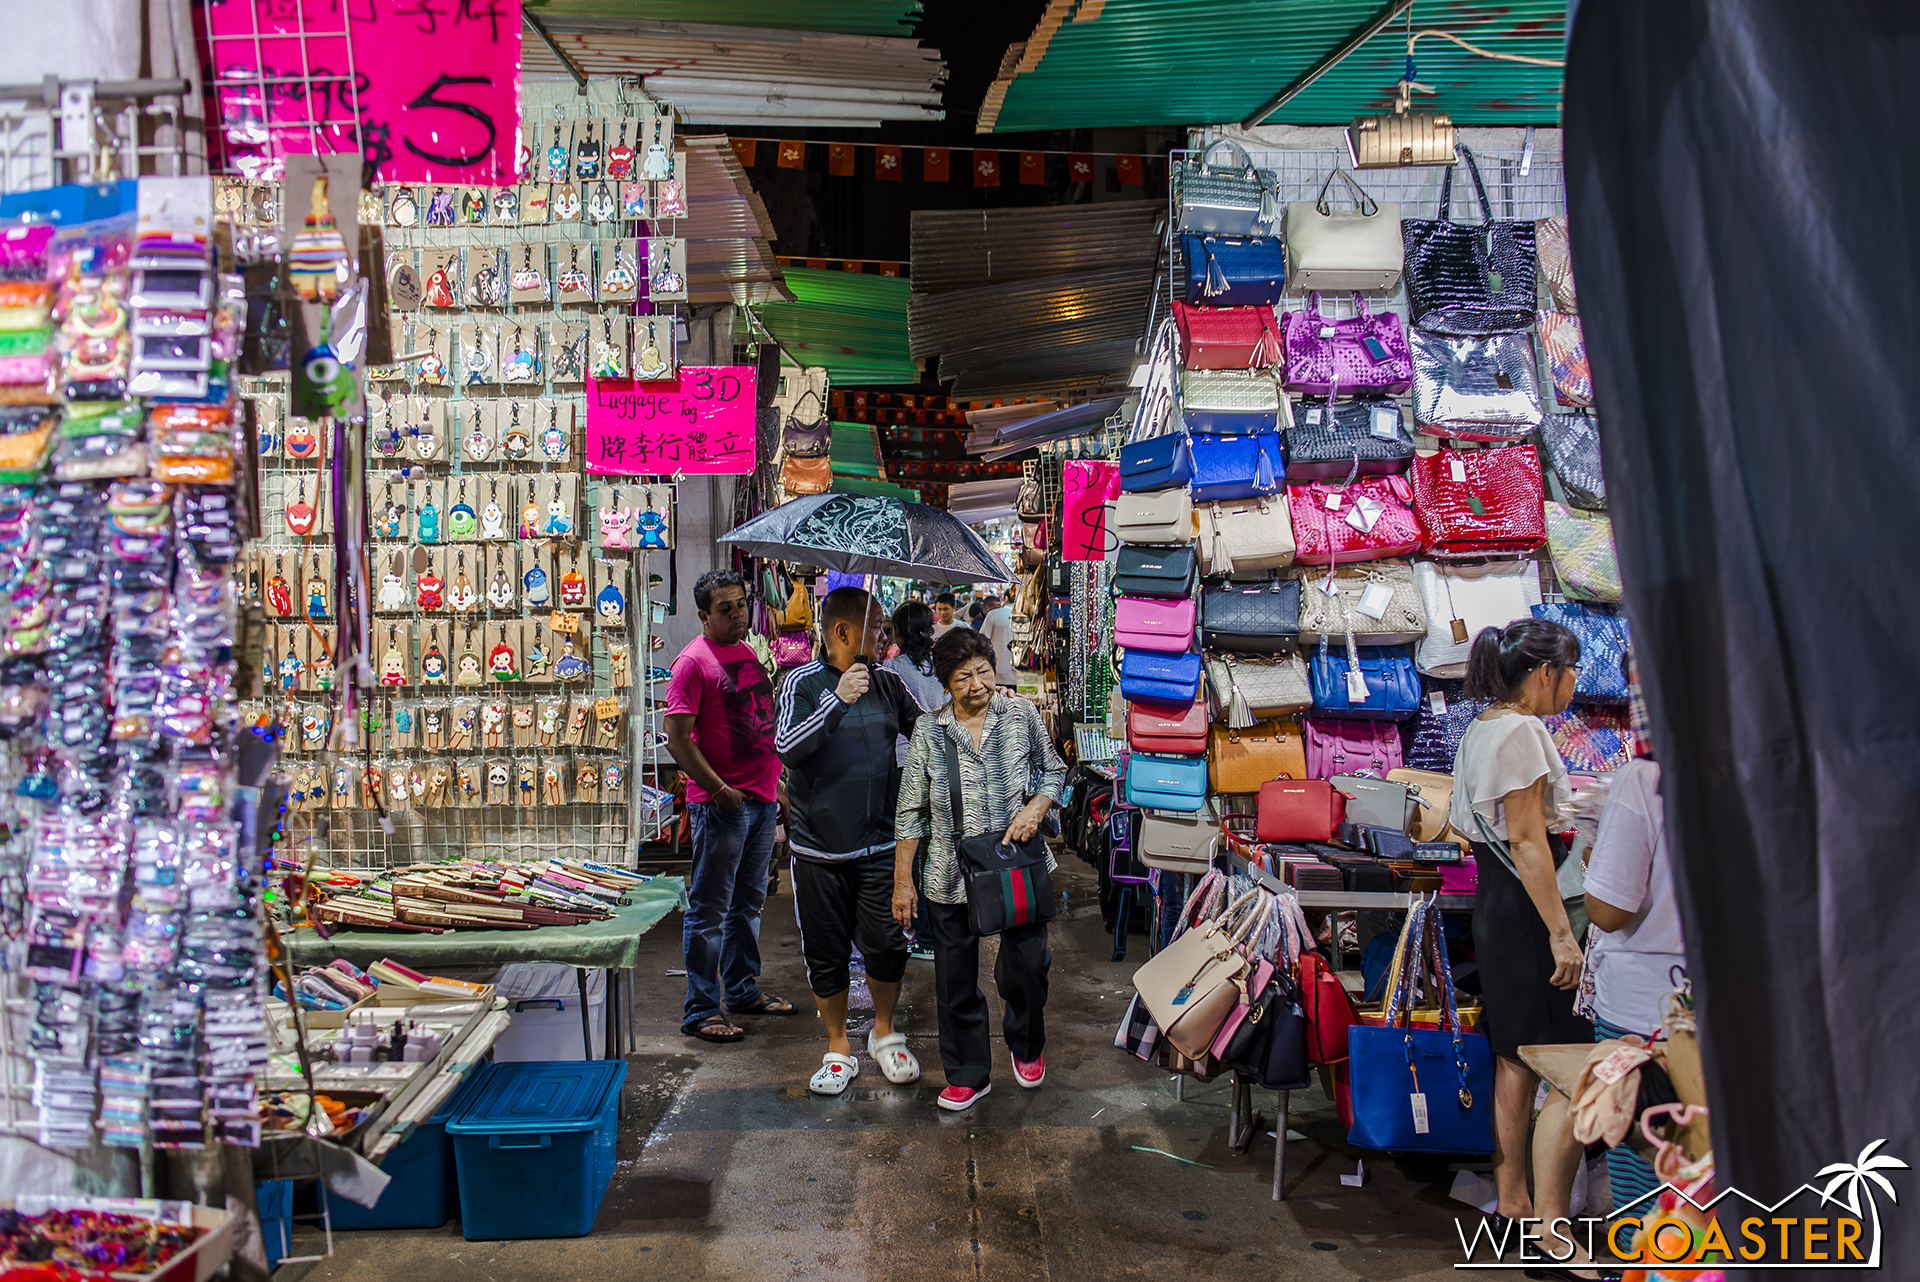 The Temple Street Night Market isn't glitzy, but good hagglers can get good deals.